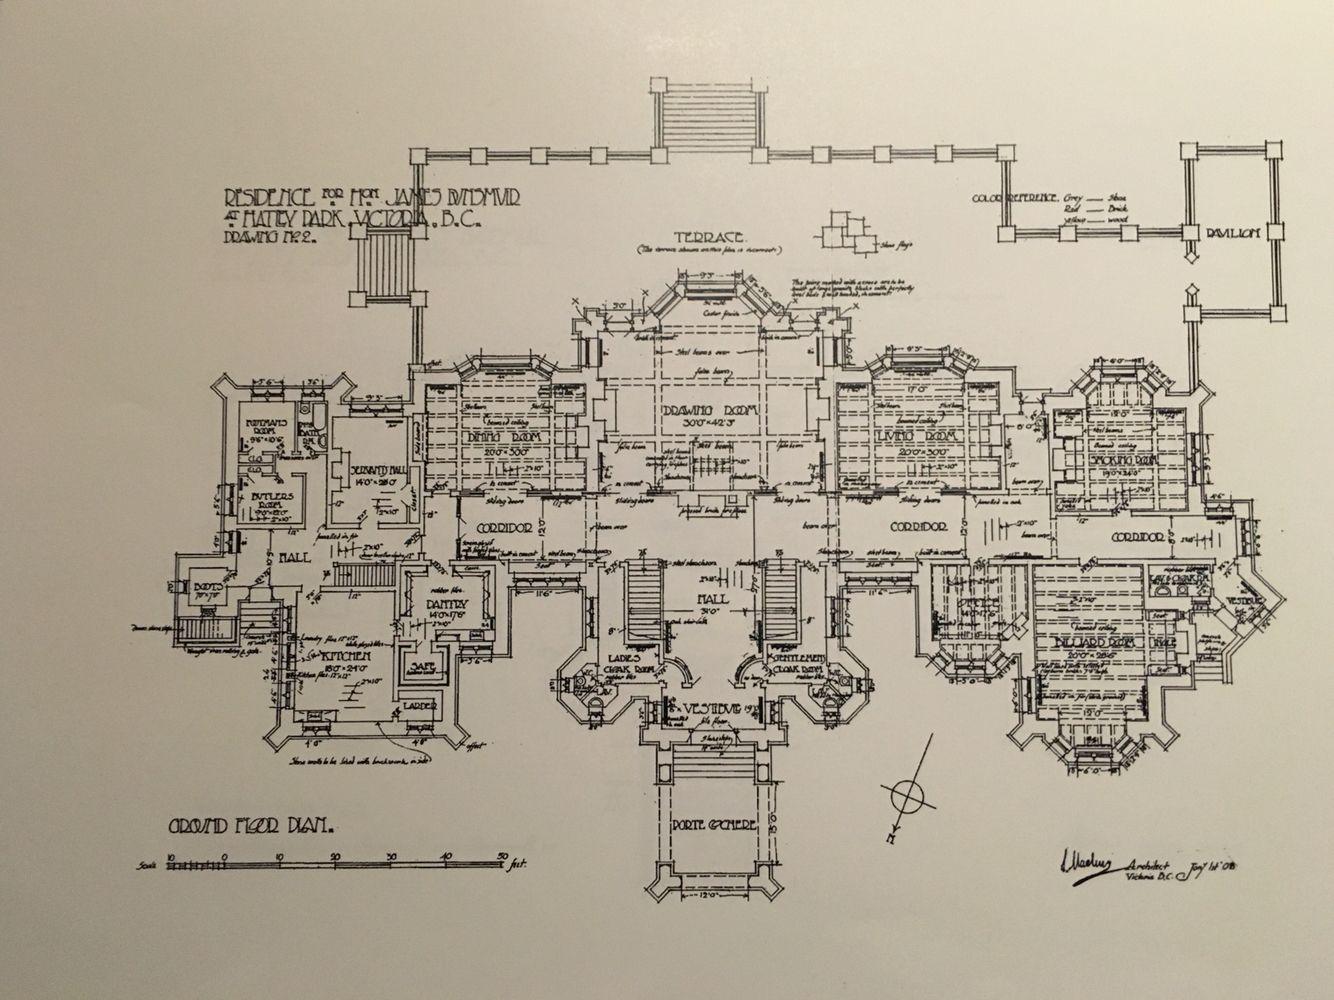 MEDIEVAL CASTLE FLOOR PLANS Home Plans Home Design Floor